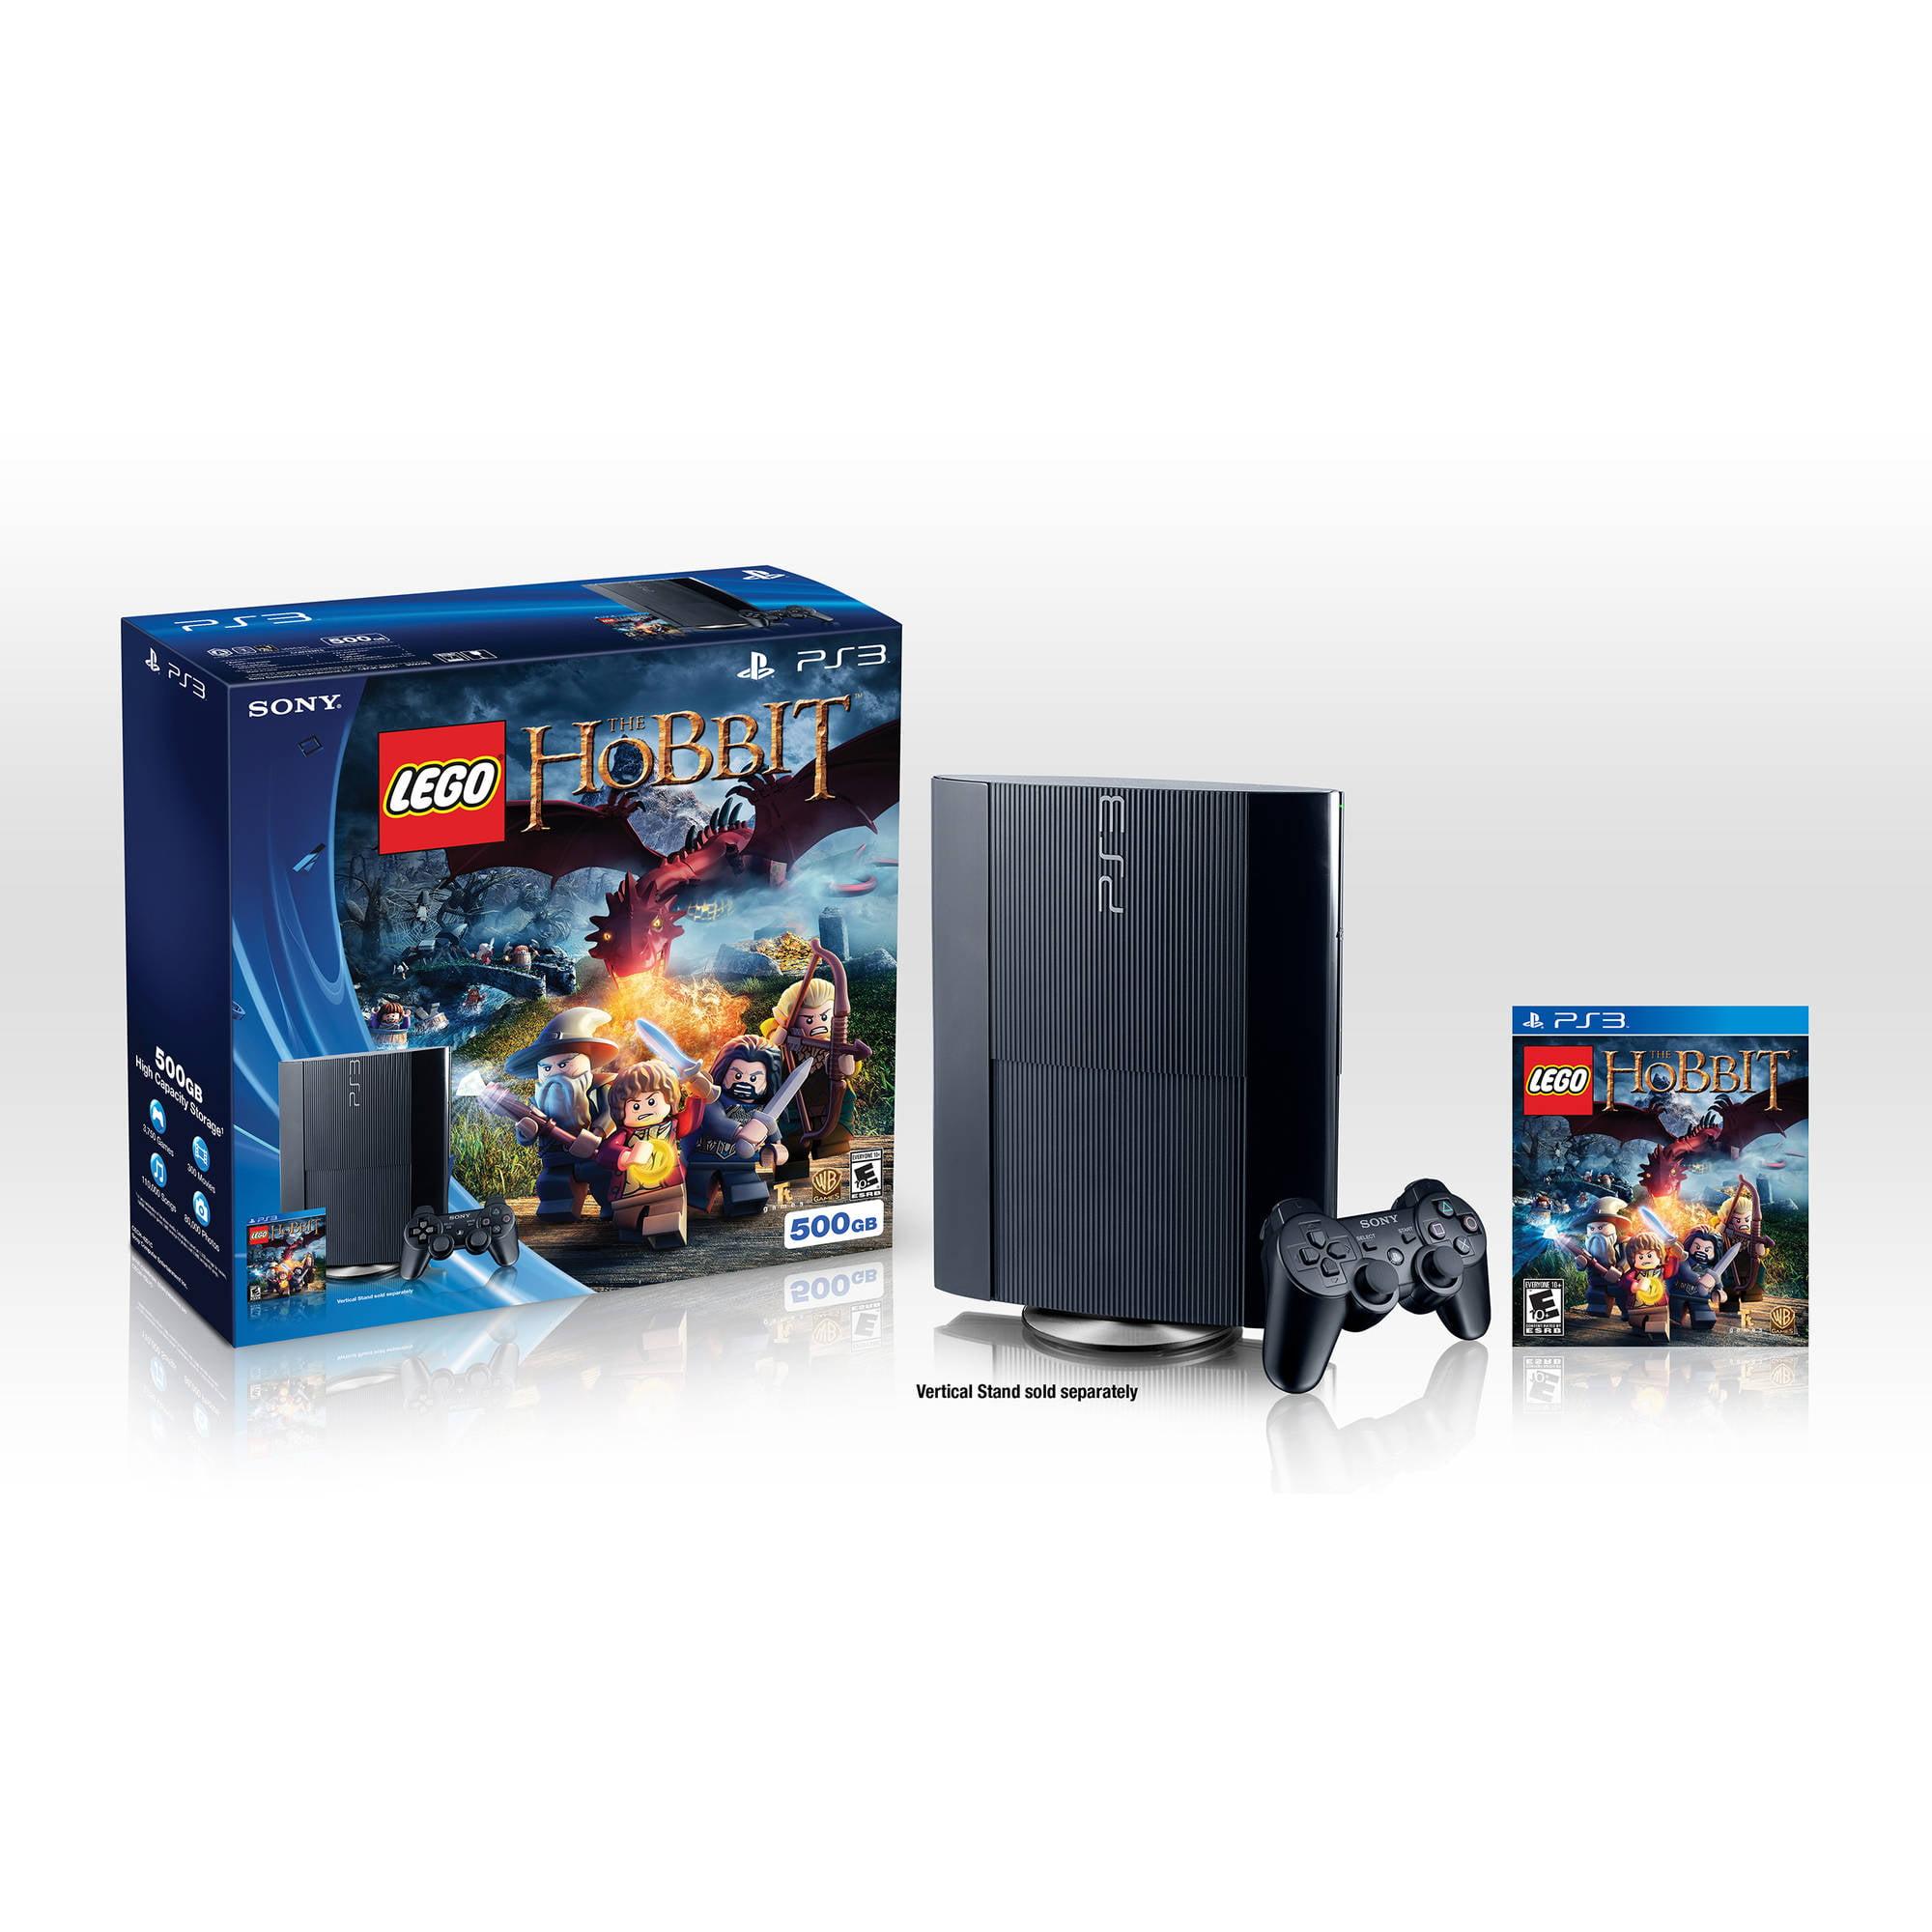 PS3 500GB Console with Lego The Hobbit Bundle - Walmart.com